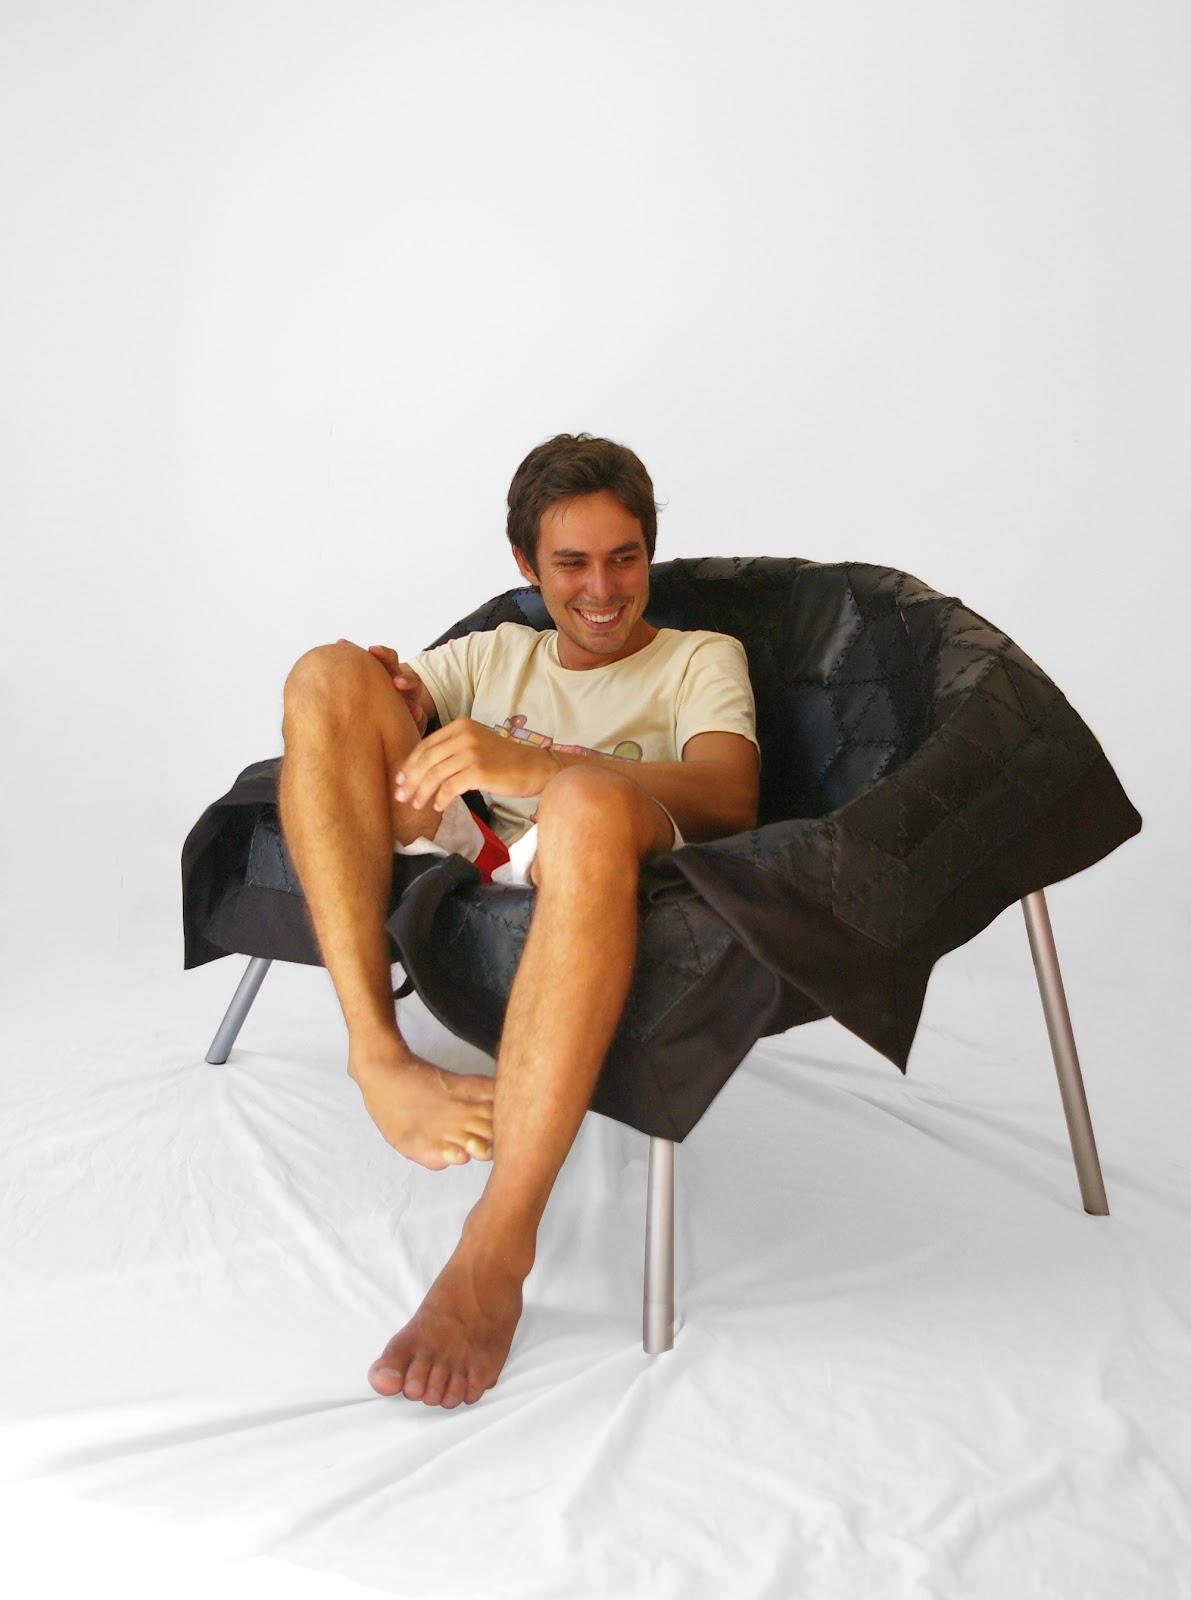 alice aubert design dise o. Black Bedroom Furniture Sets. Home Design Ideas